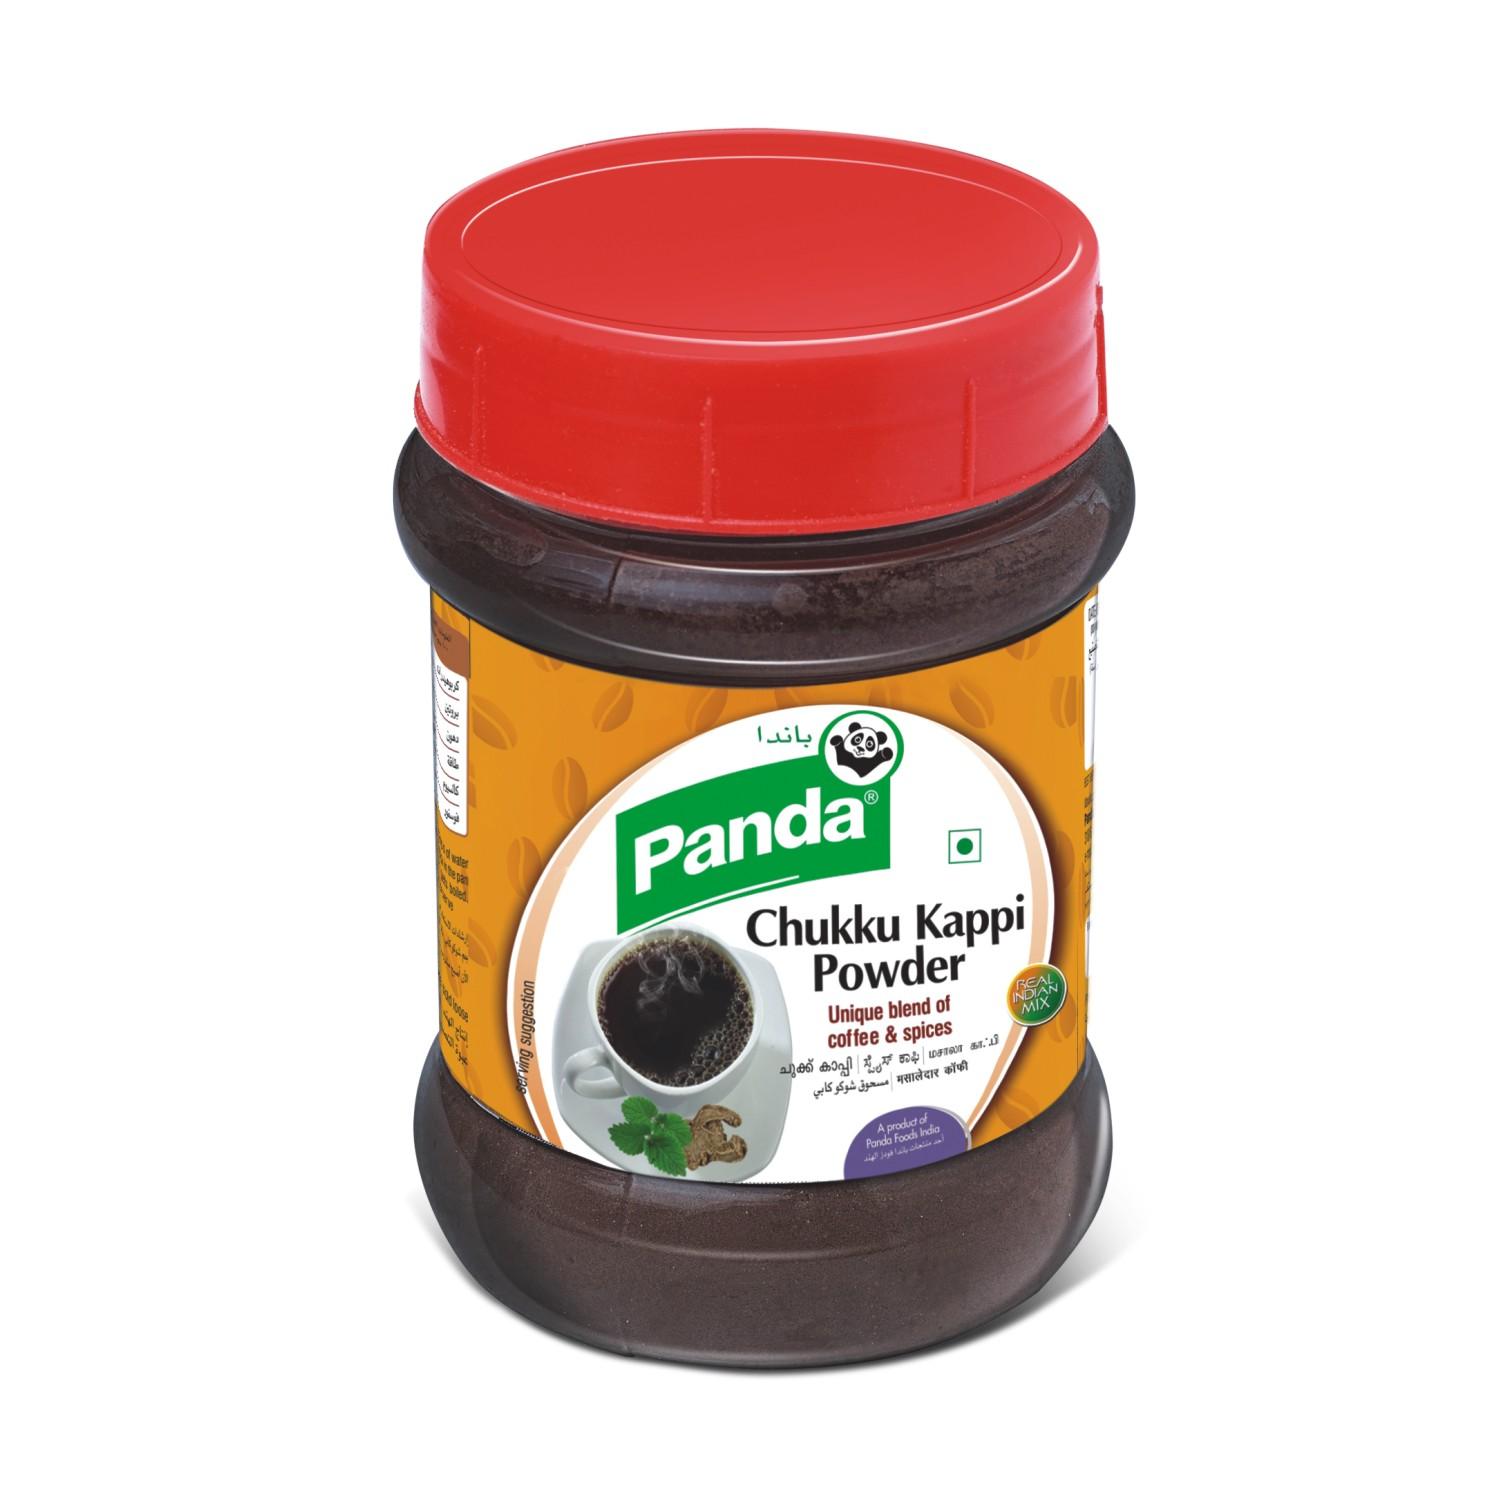 Chukku Kappi Powder